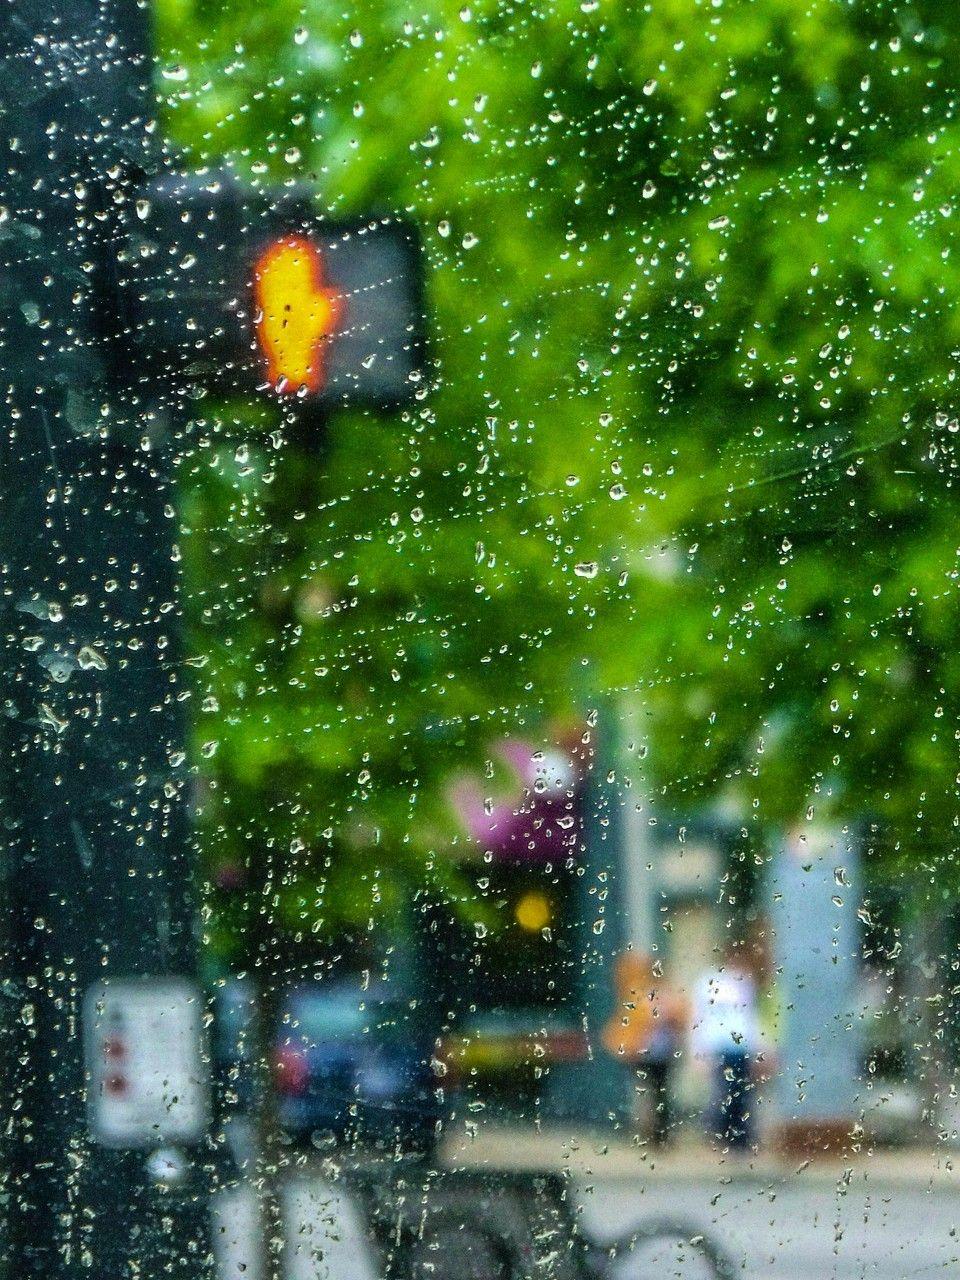 Rainy Background Hd